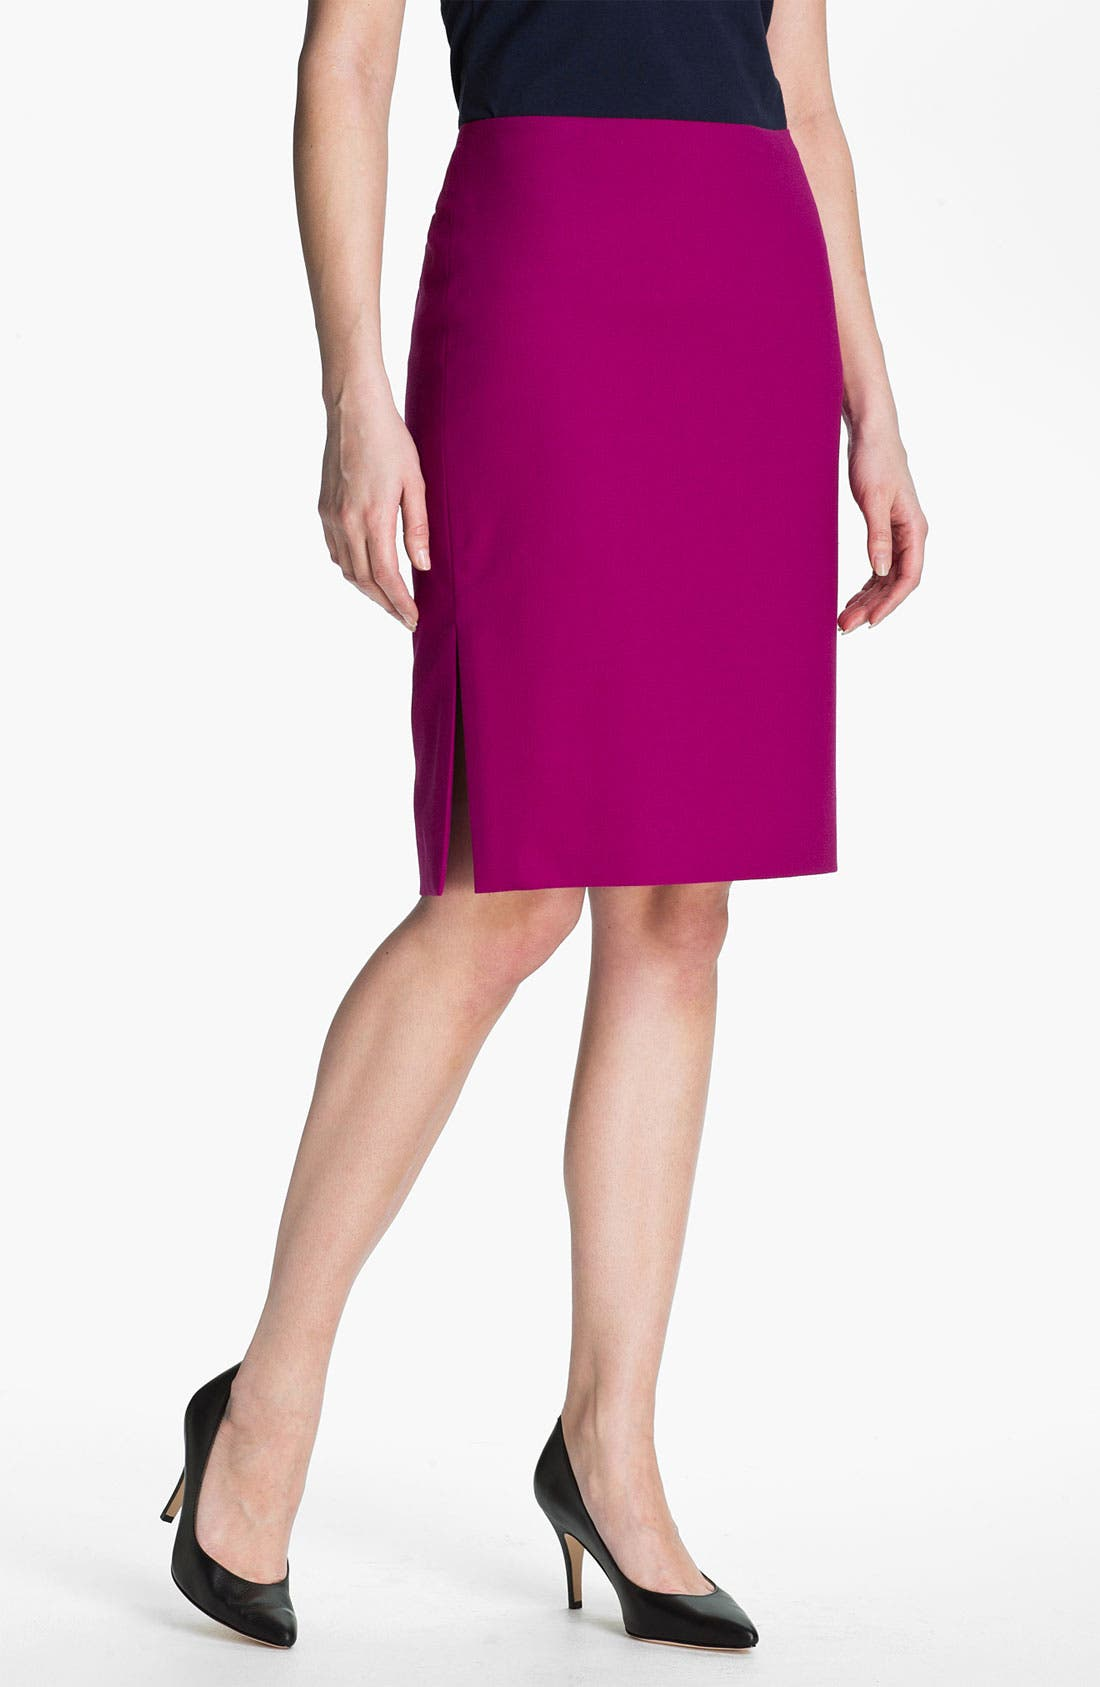 Alternate Image 1 Selected - Anne Klein Crepe Pencil Skirt